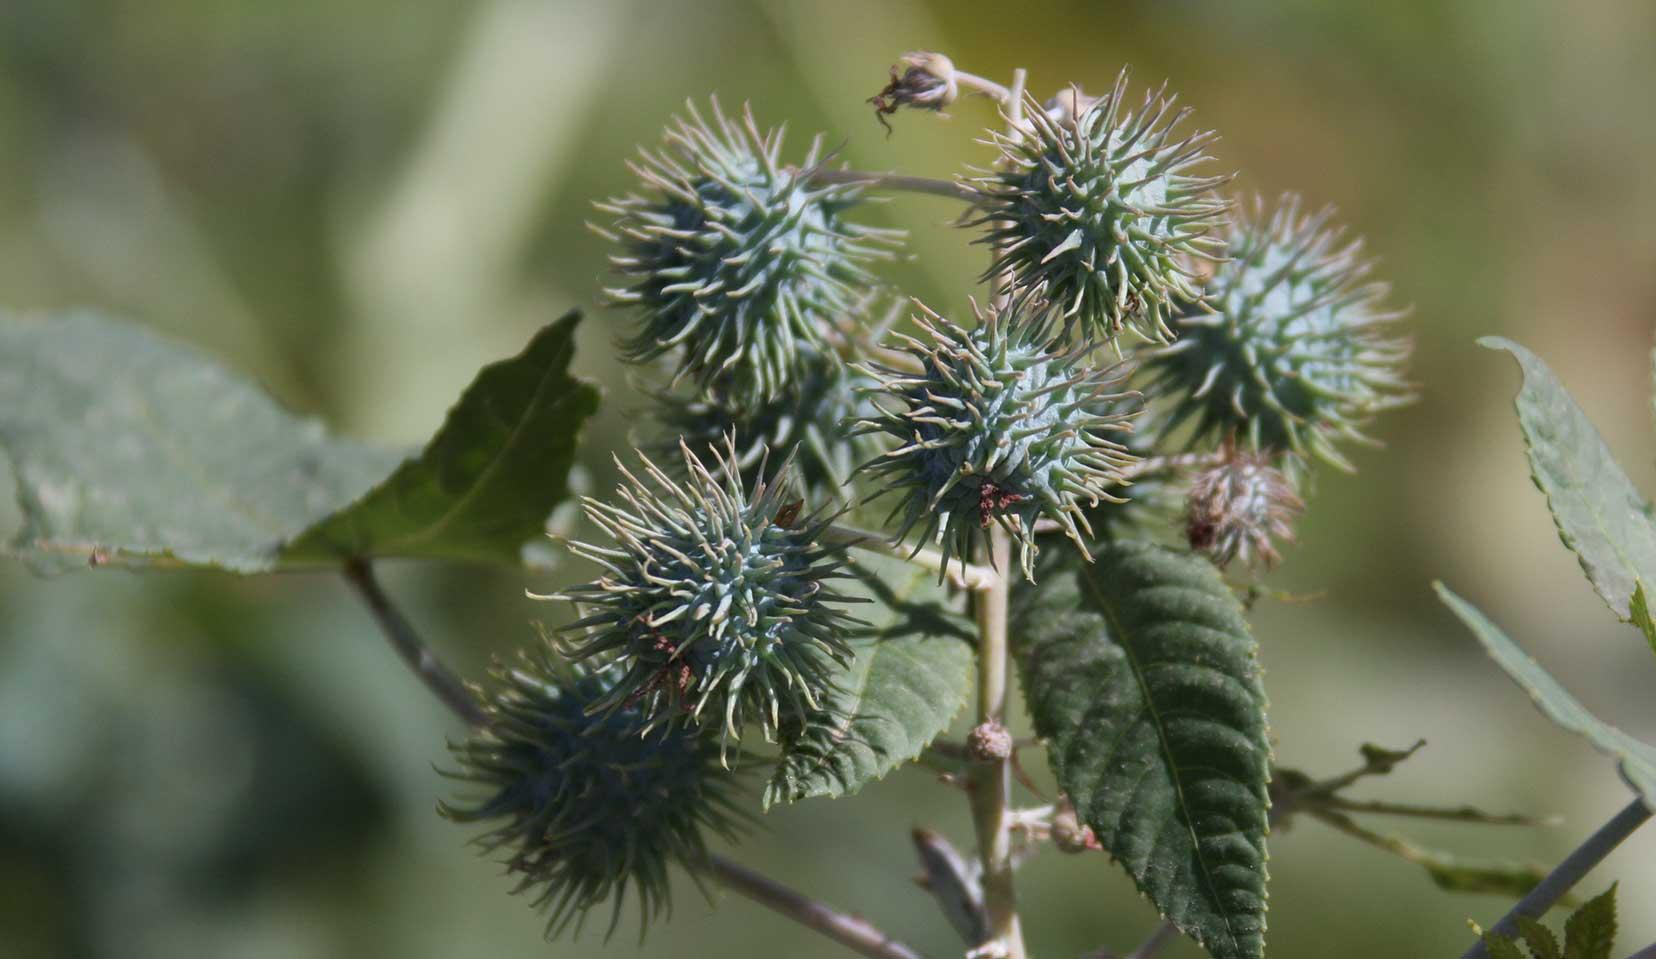 Castor Oil Plant Ricinus Communis L Euphorbiaceae Spurge Family Organic And Natural Skin Care Dr Hauschka Skin Care